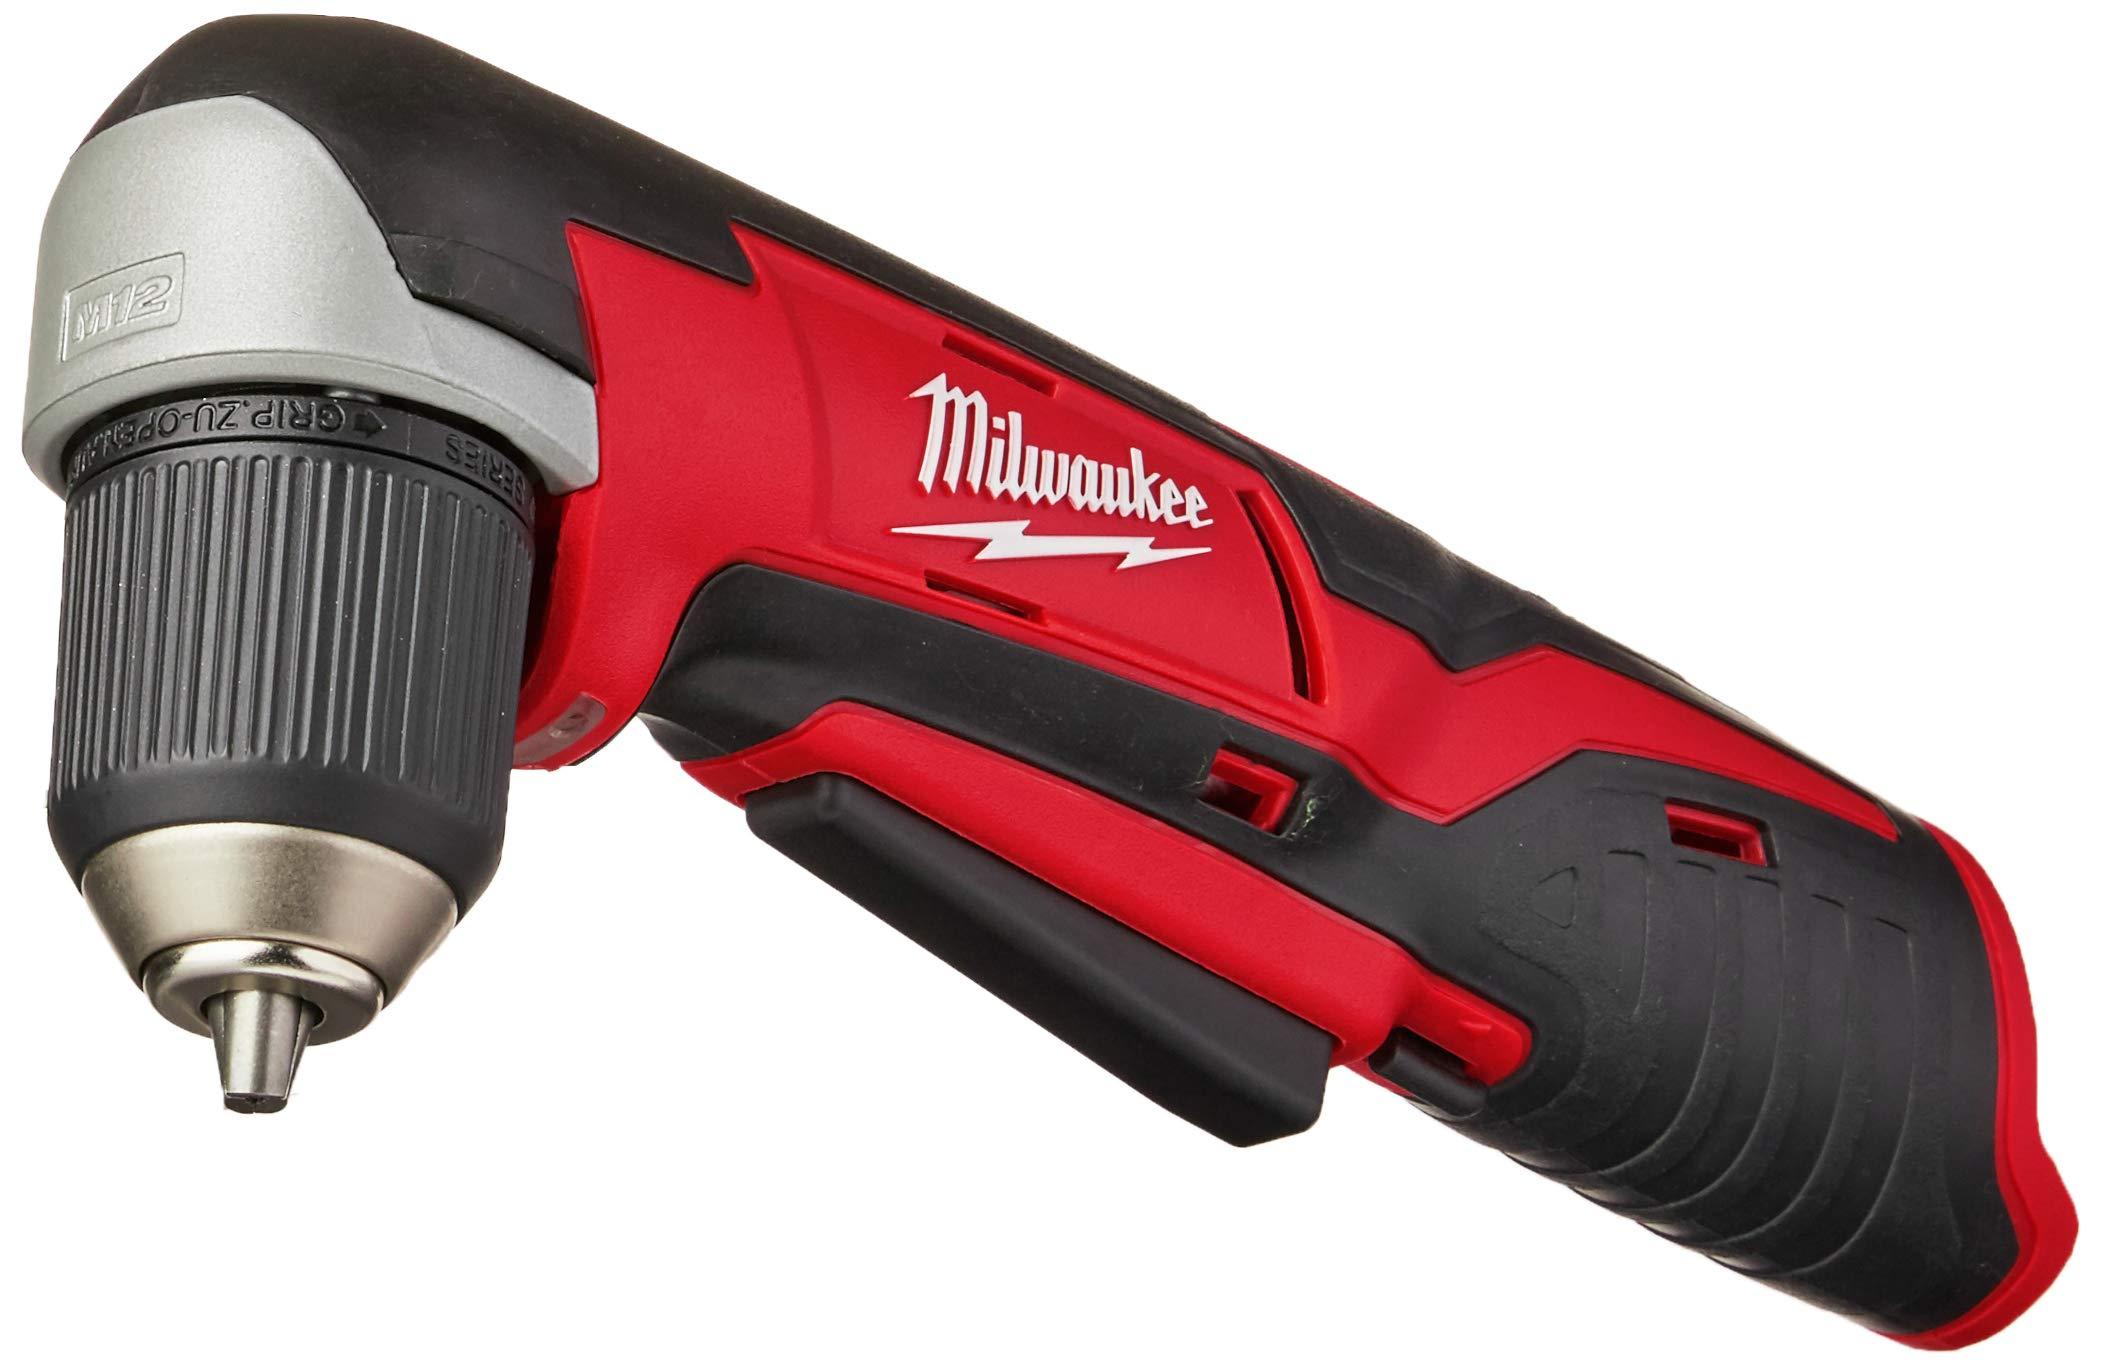 Bare Tool Milwaukee 2415 20 12 Volt Cordless